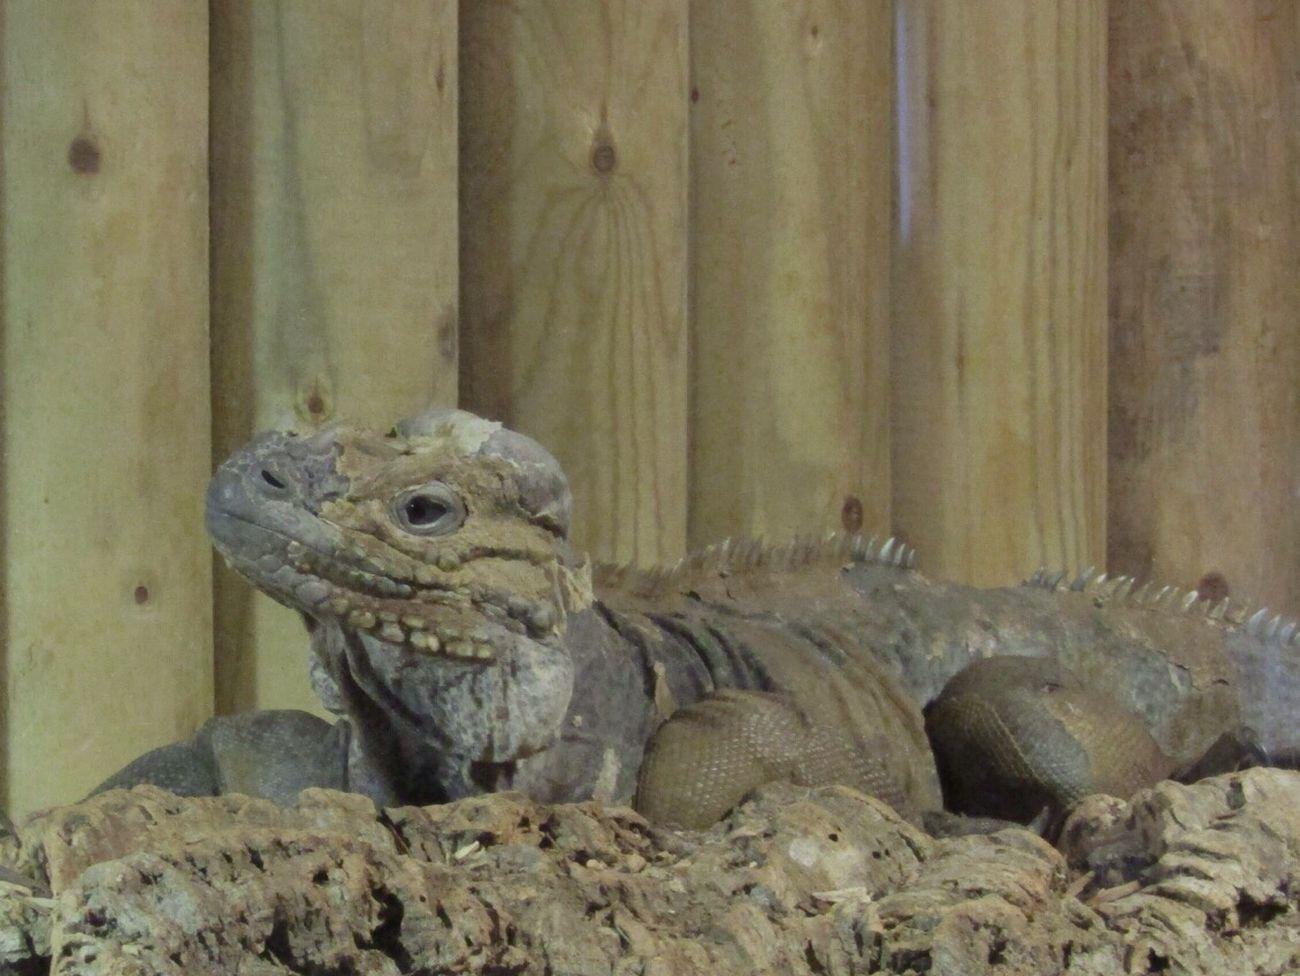 Iguana Lizard Lizard Nature Close-up